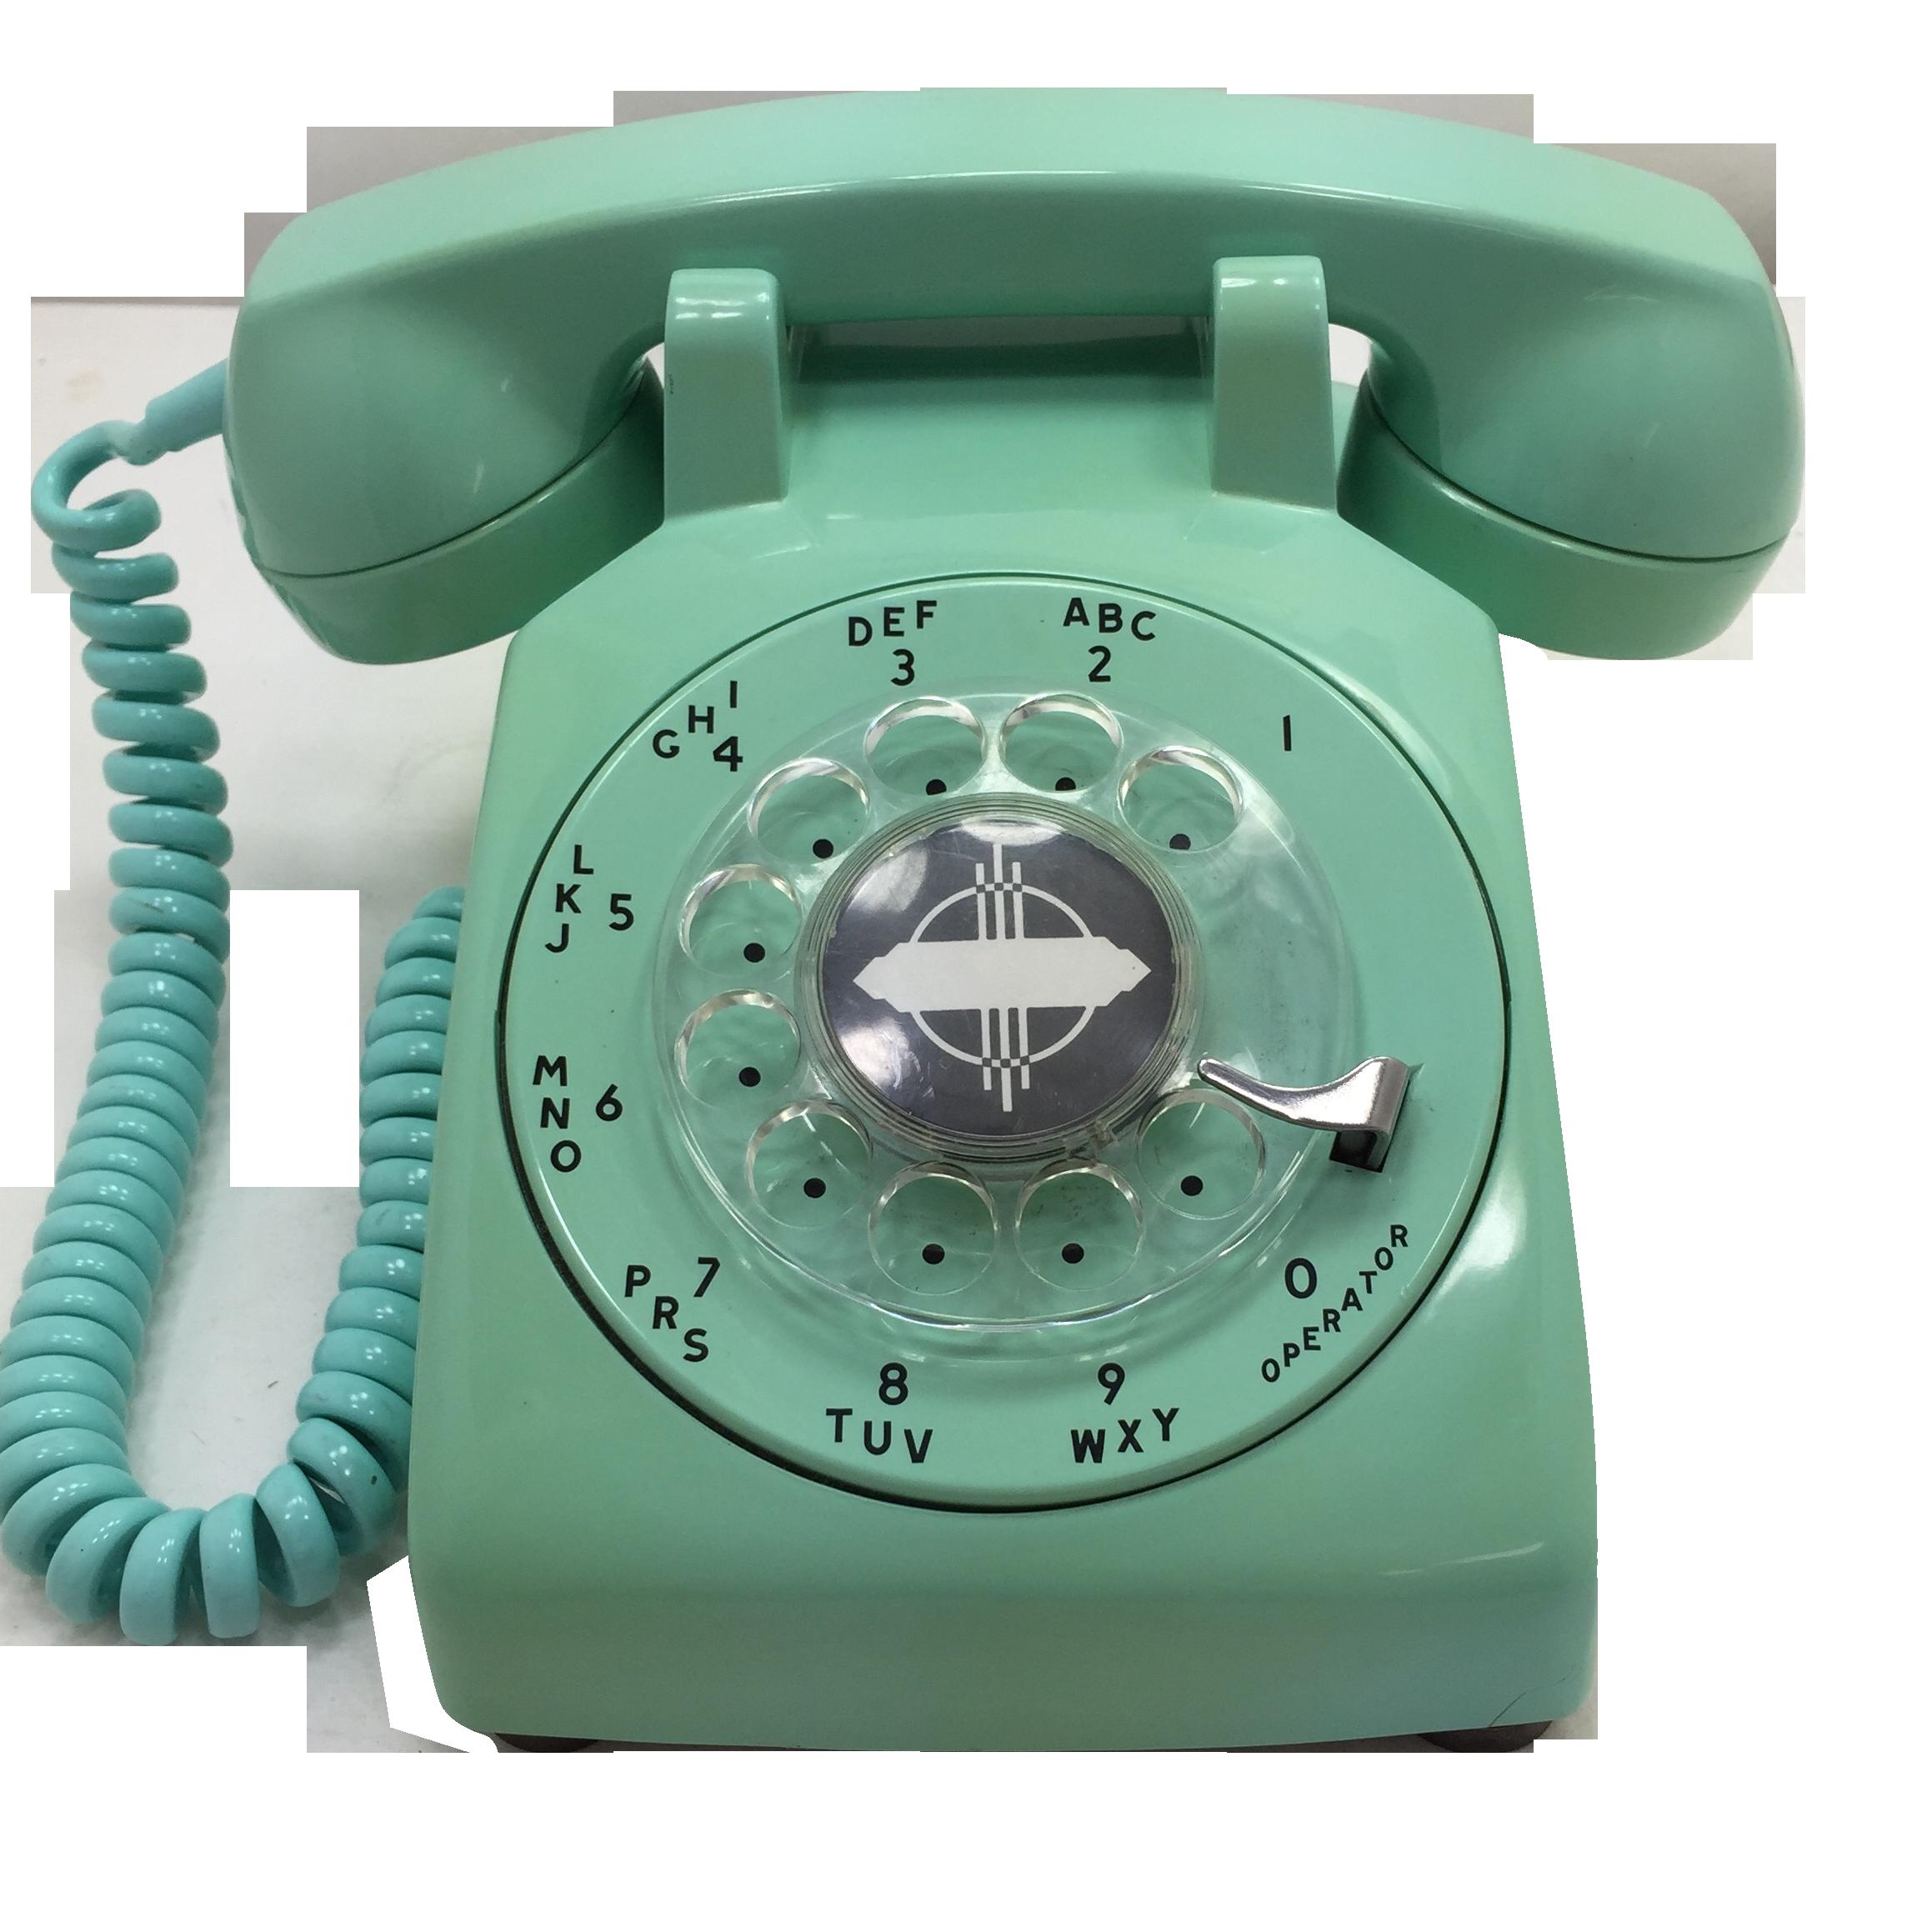 Stromberg Carlson Rotary Dial Desk Phone Phone Desk Phone Retro Phone